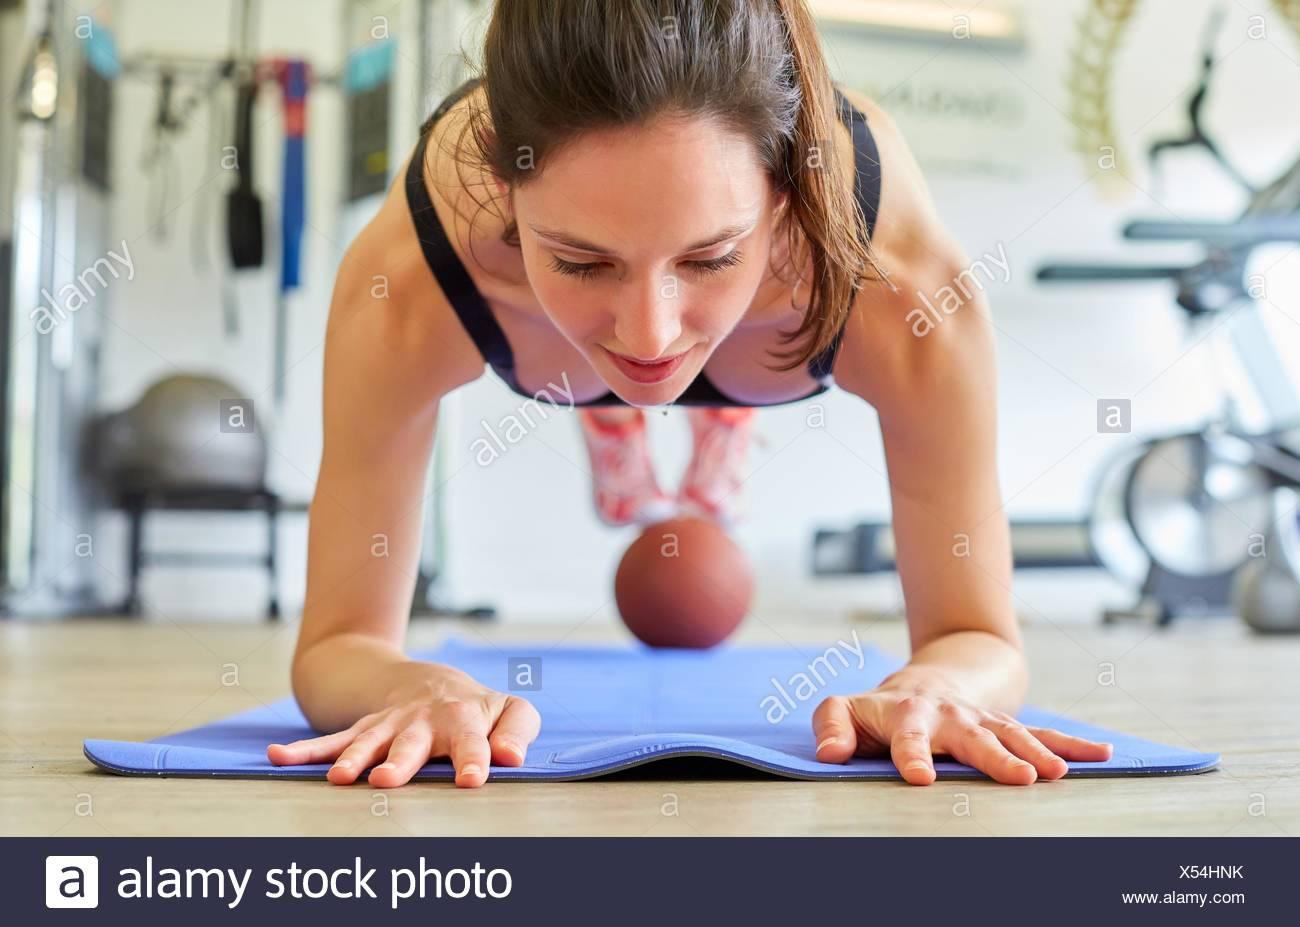 Frau macht Liegestütze mit Ball im Fitness-Studio Stockbild